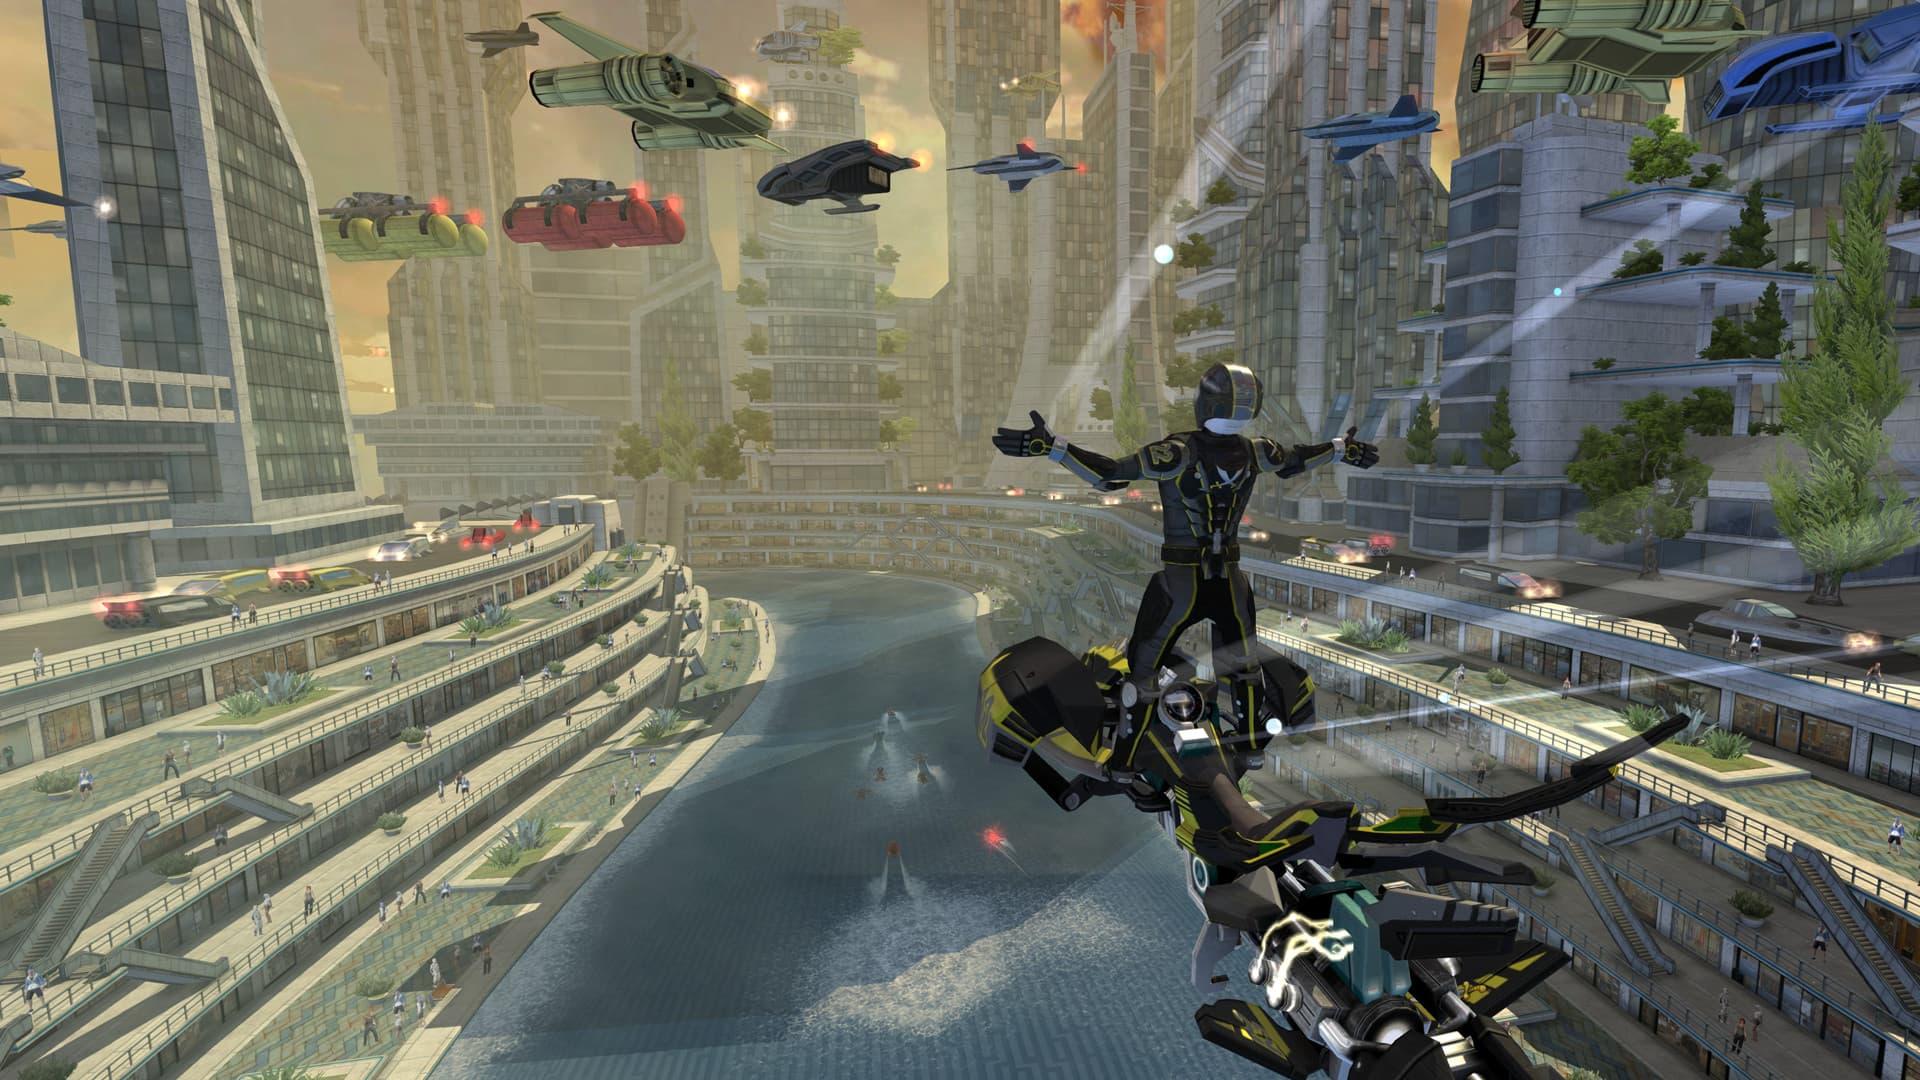 Riptide GP: Renegade Xbox One